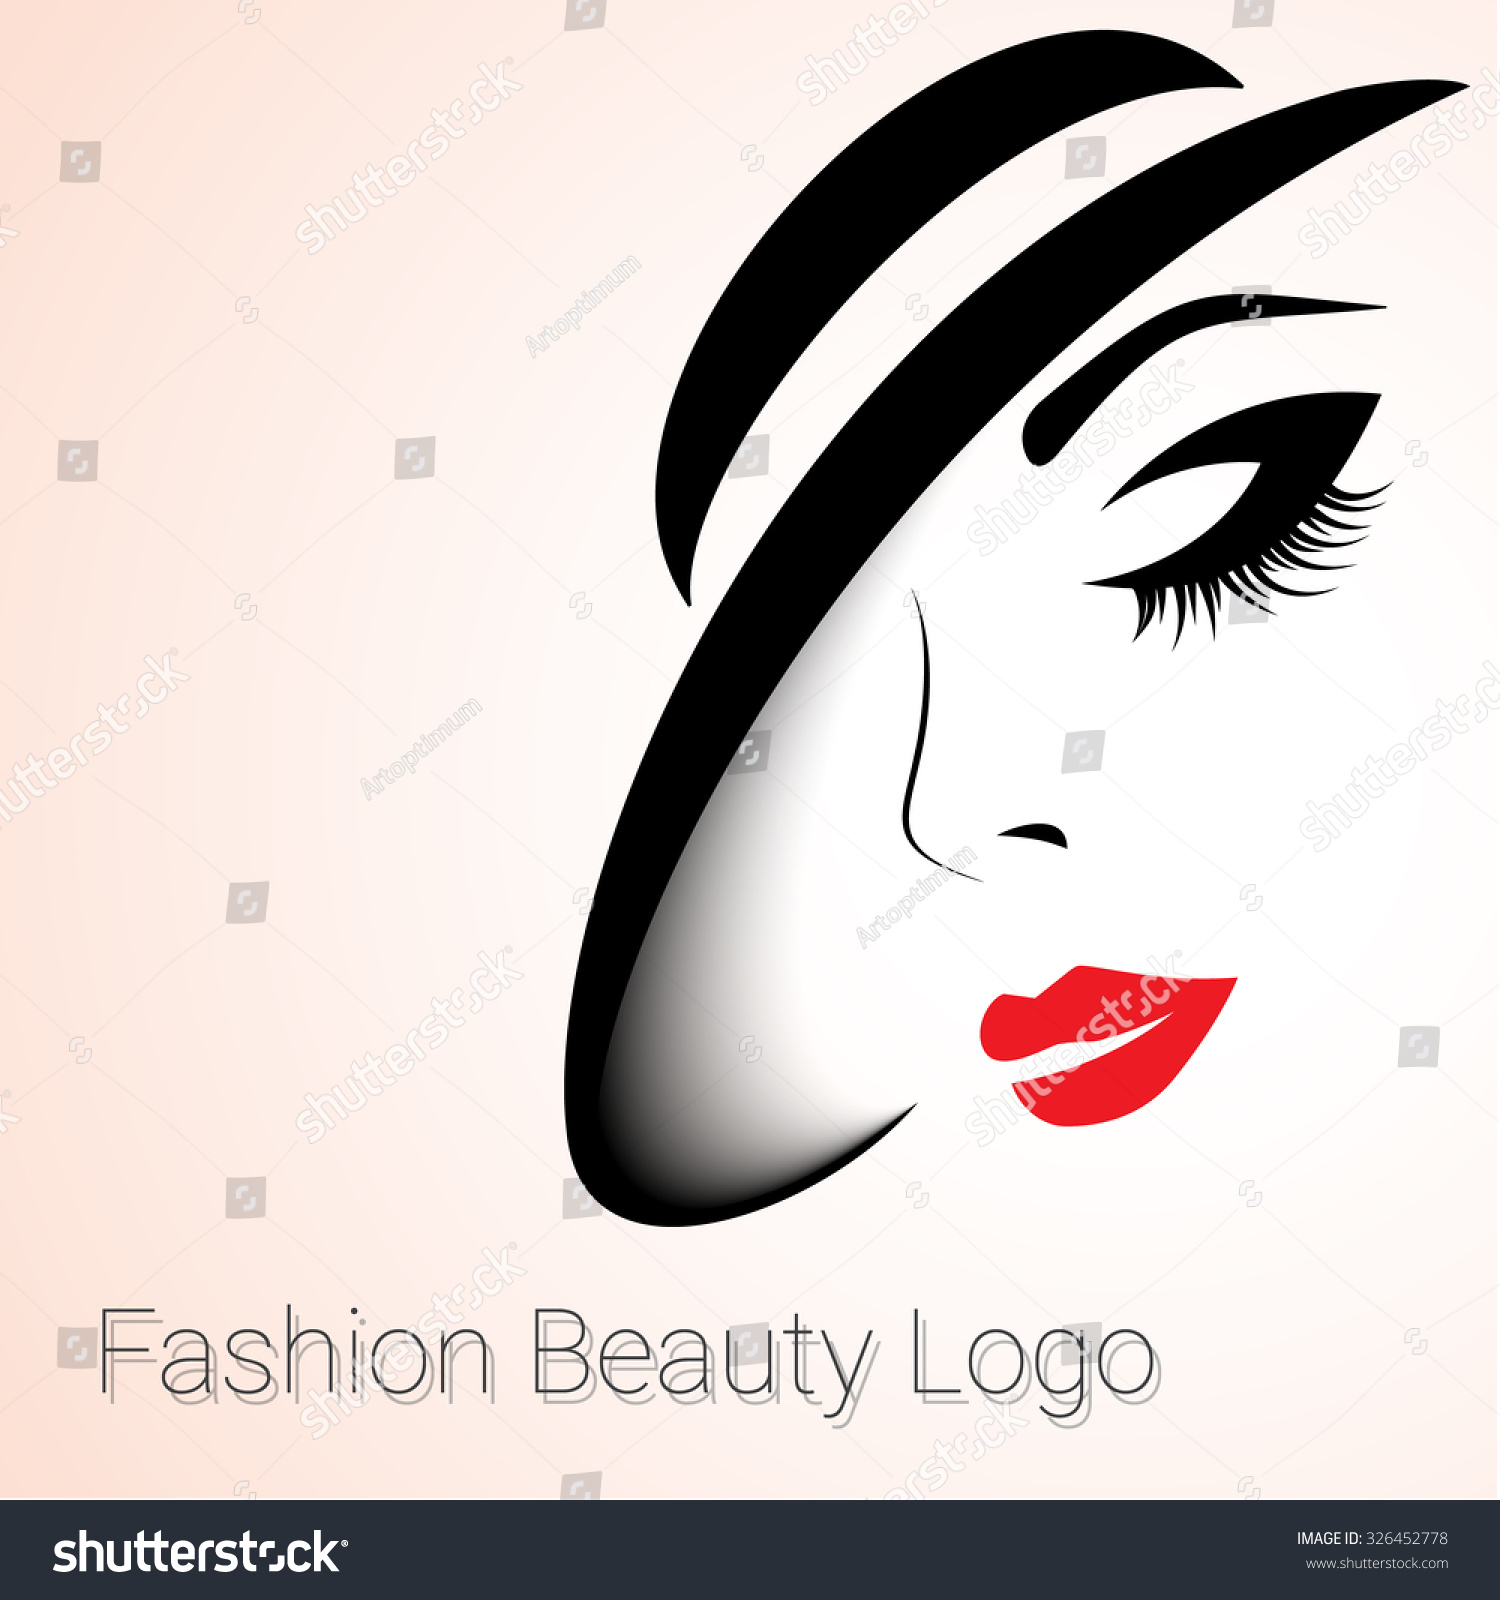 Fashion Beauty Logo Big Variant Womans Stock Illustration